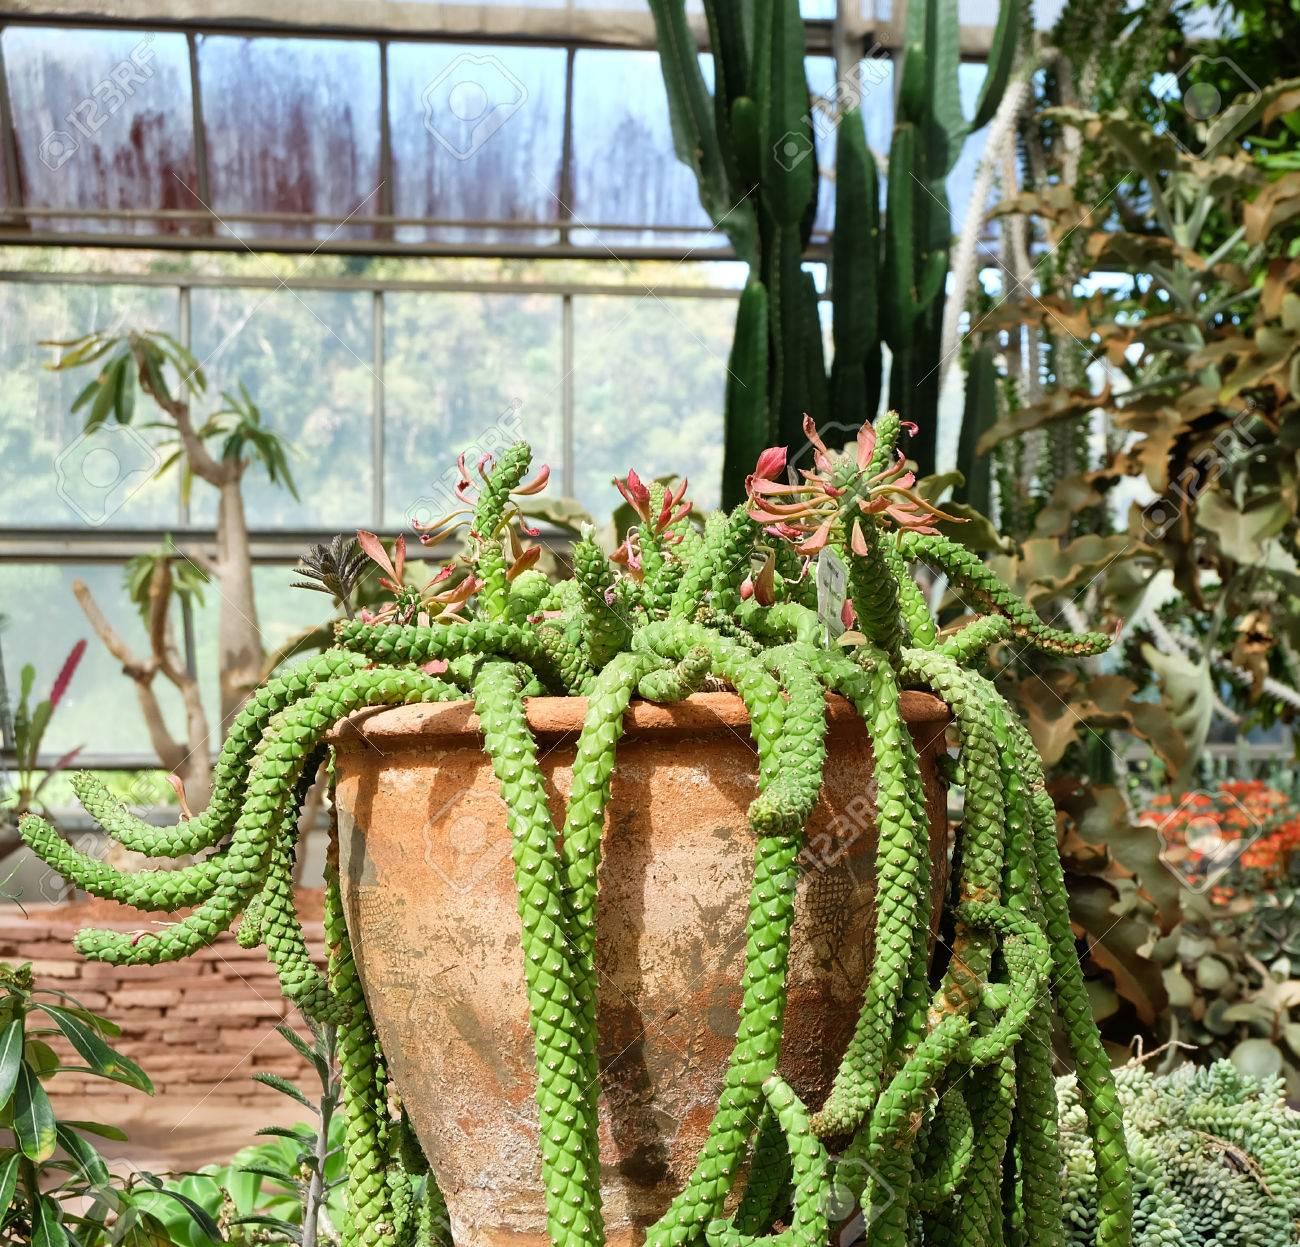 Cactus In A Cactus Garden Medusa Cactus Stock Photo Picture And